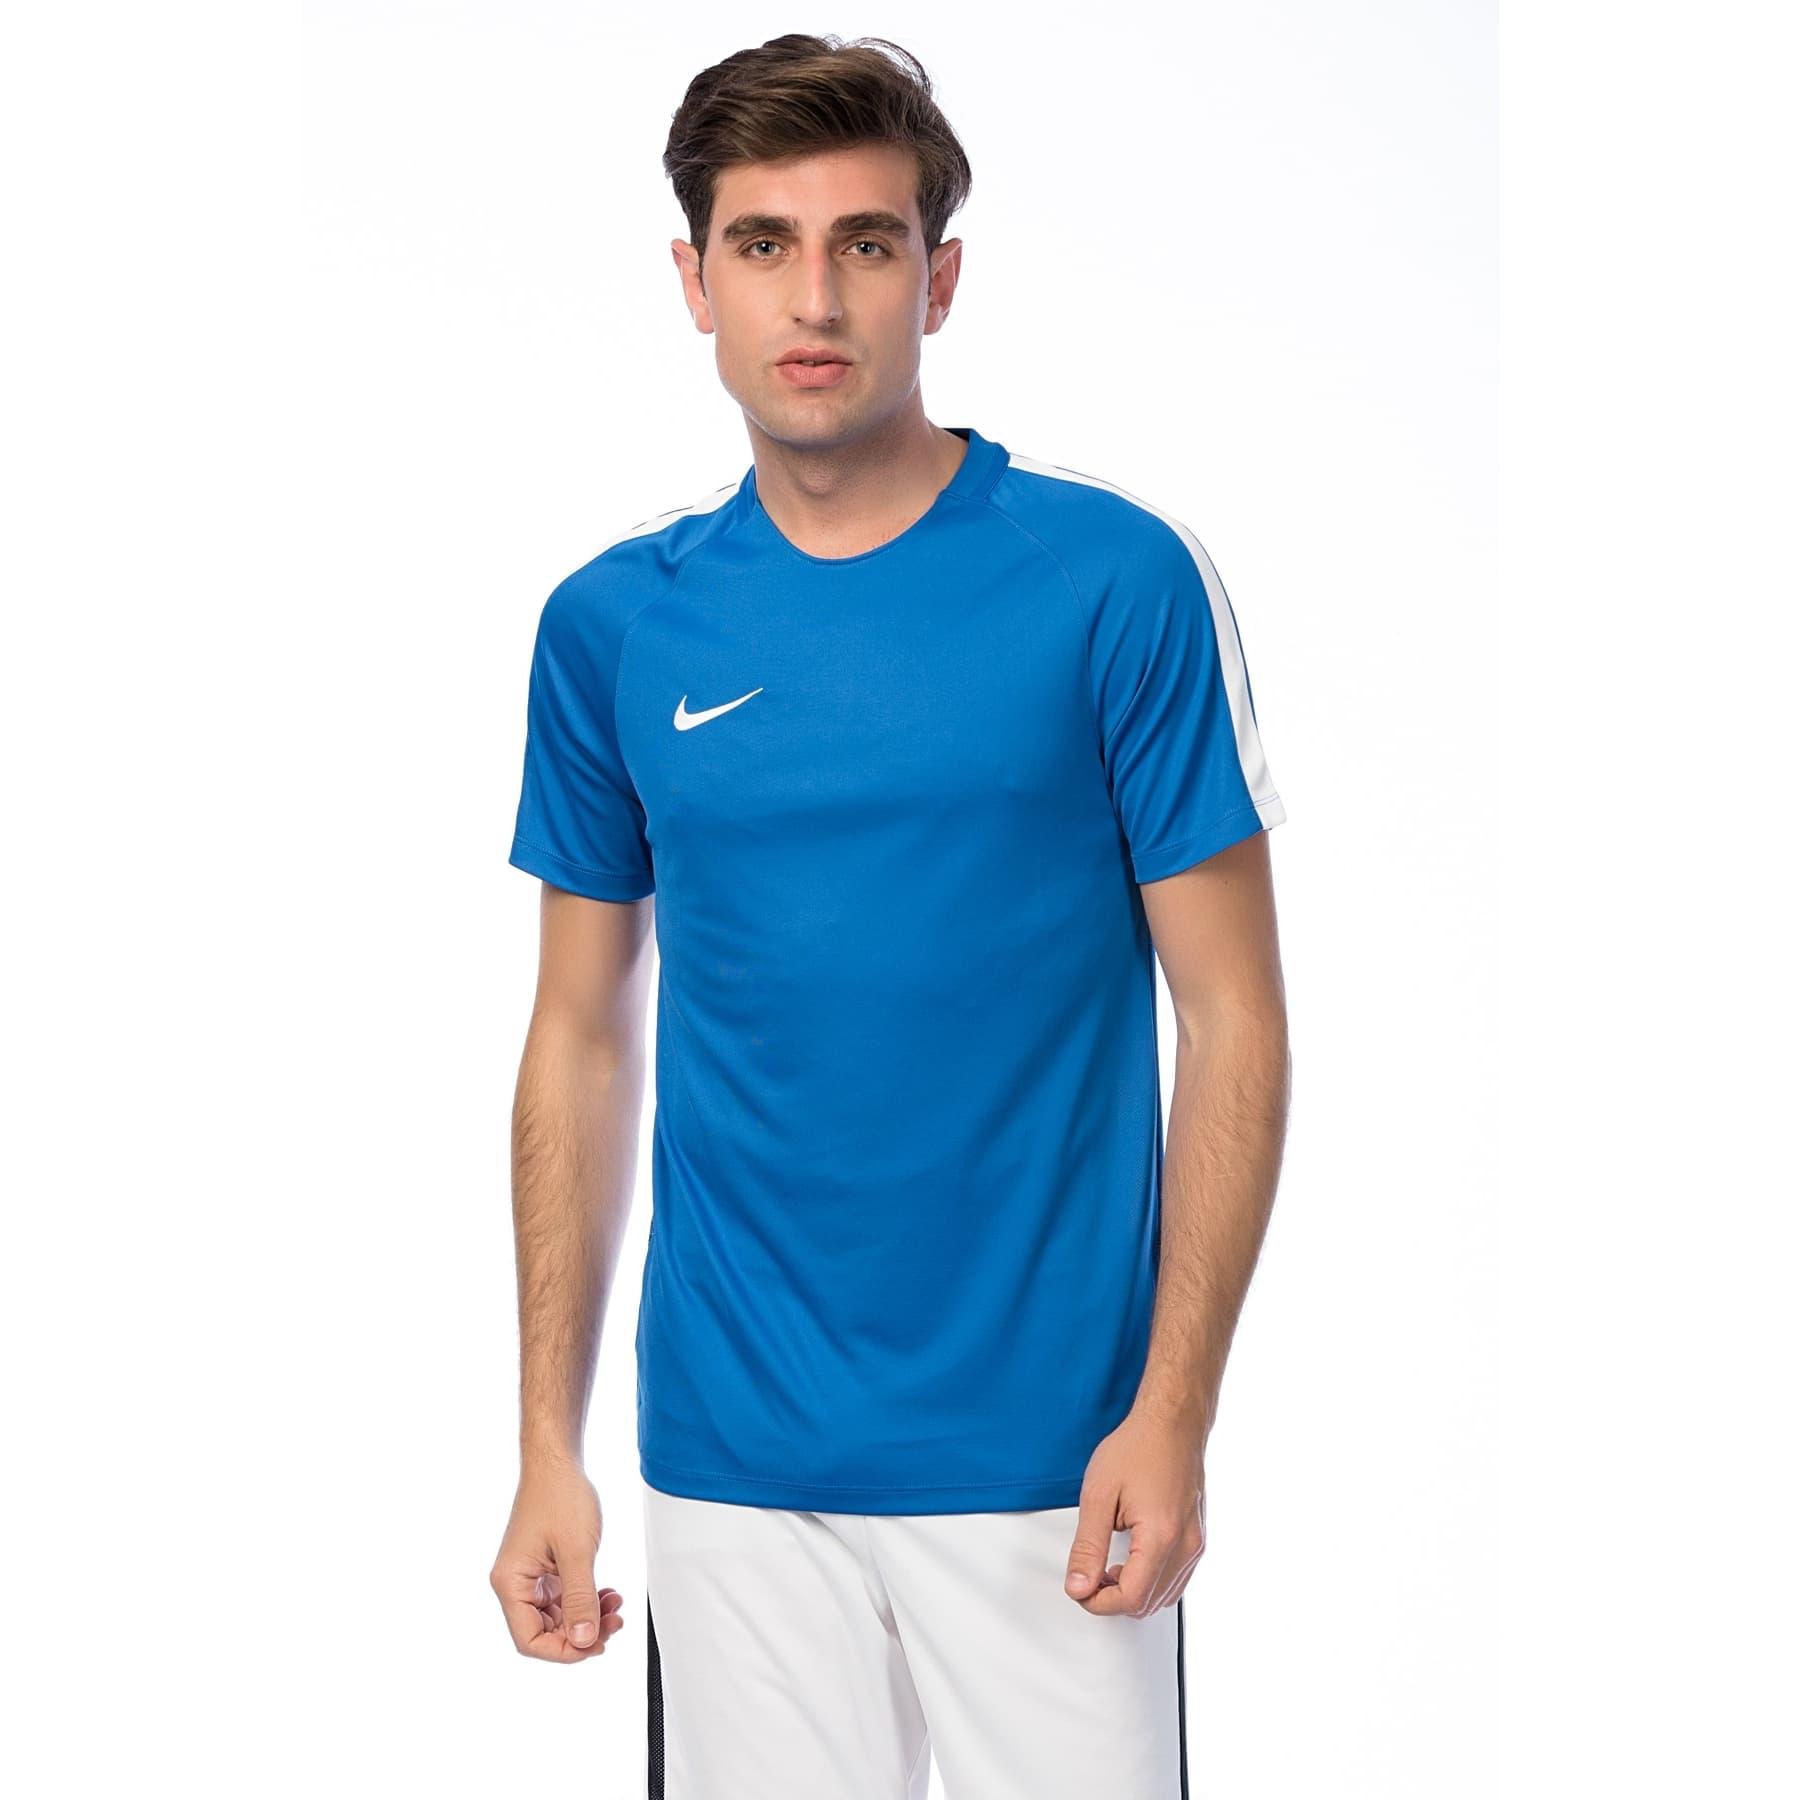 Dri-Fit Squad17 Erkek Mavi Spor Tişört (831567-463)